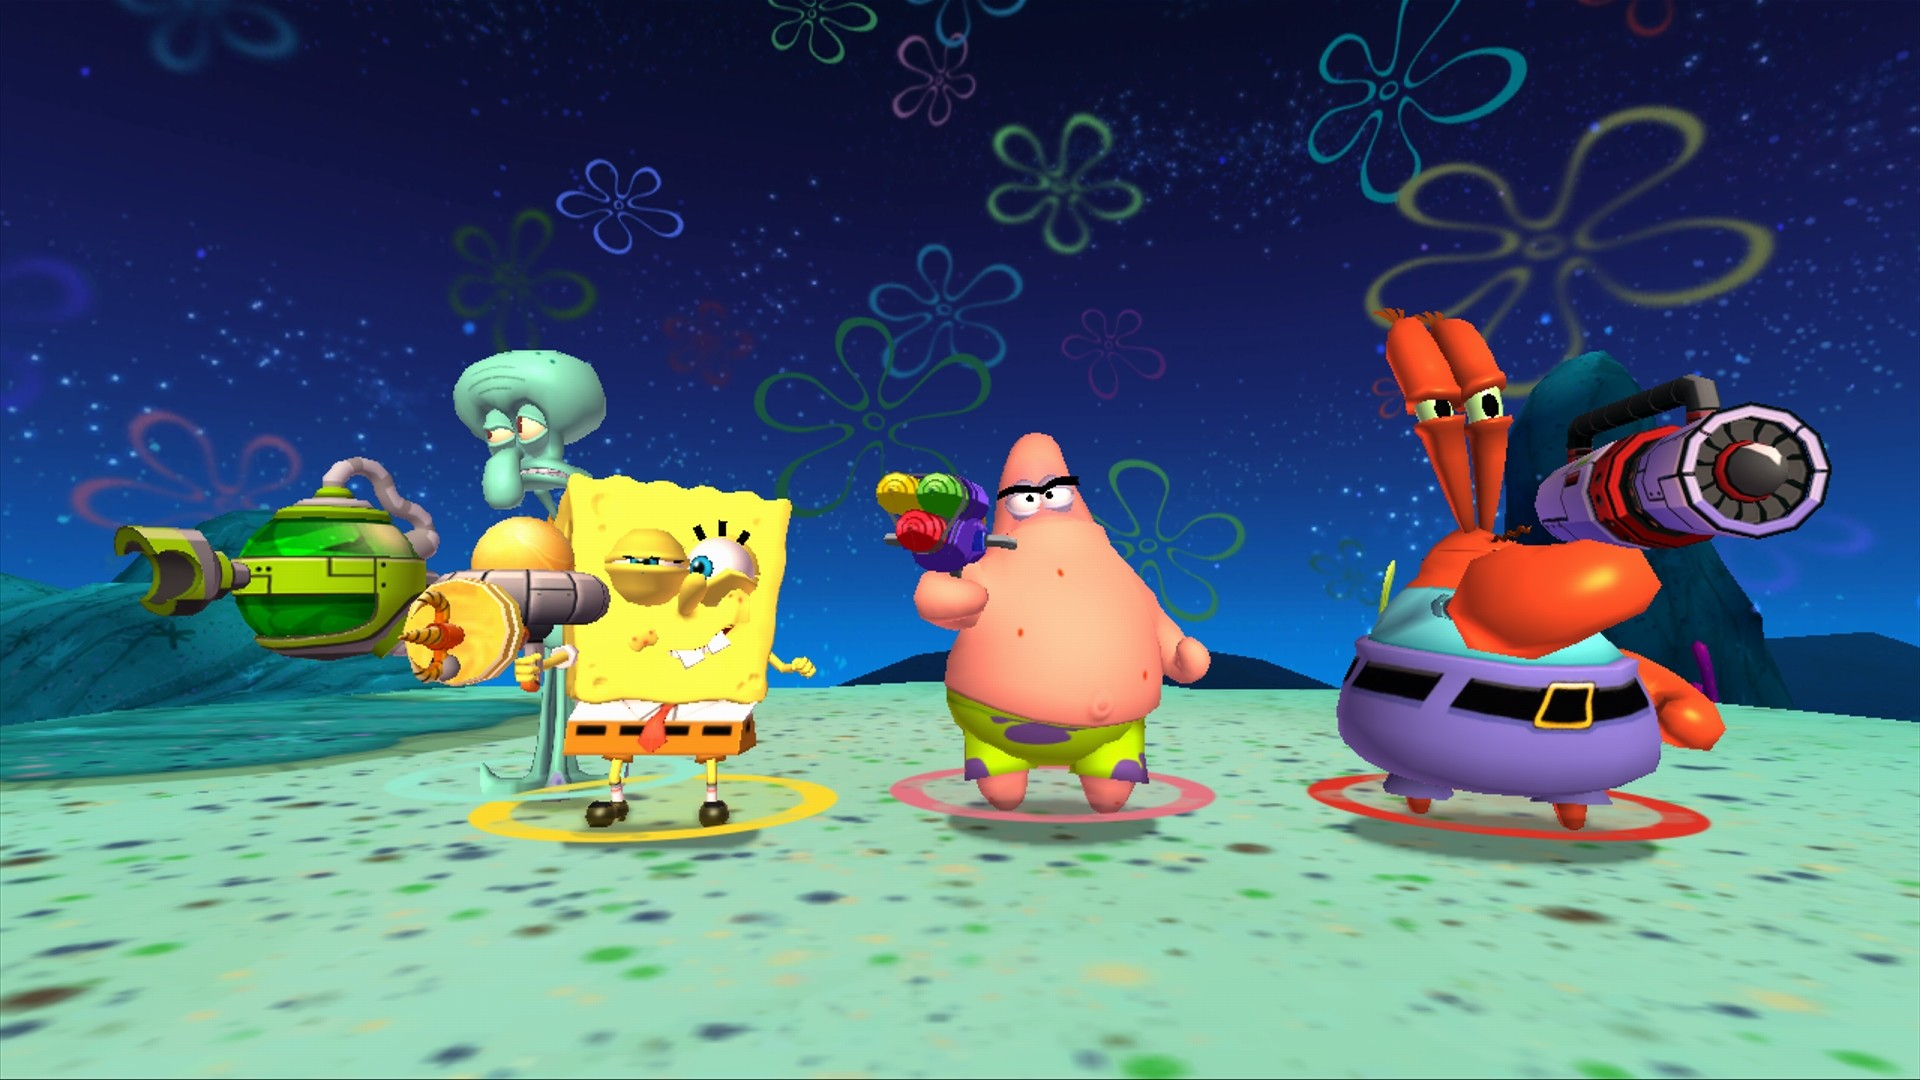 spongebob background hd free | Desktop Backgrounds for Free HD .